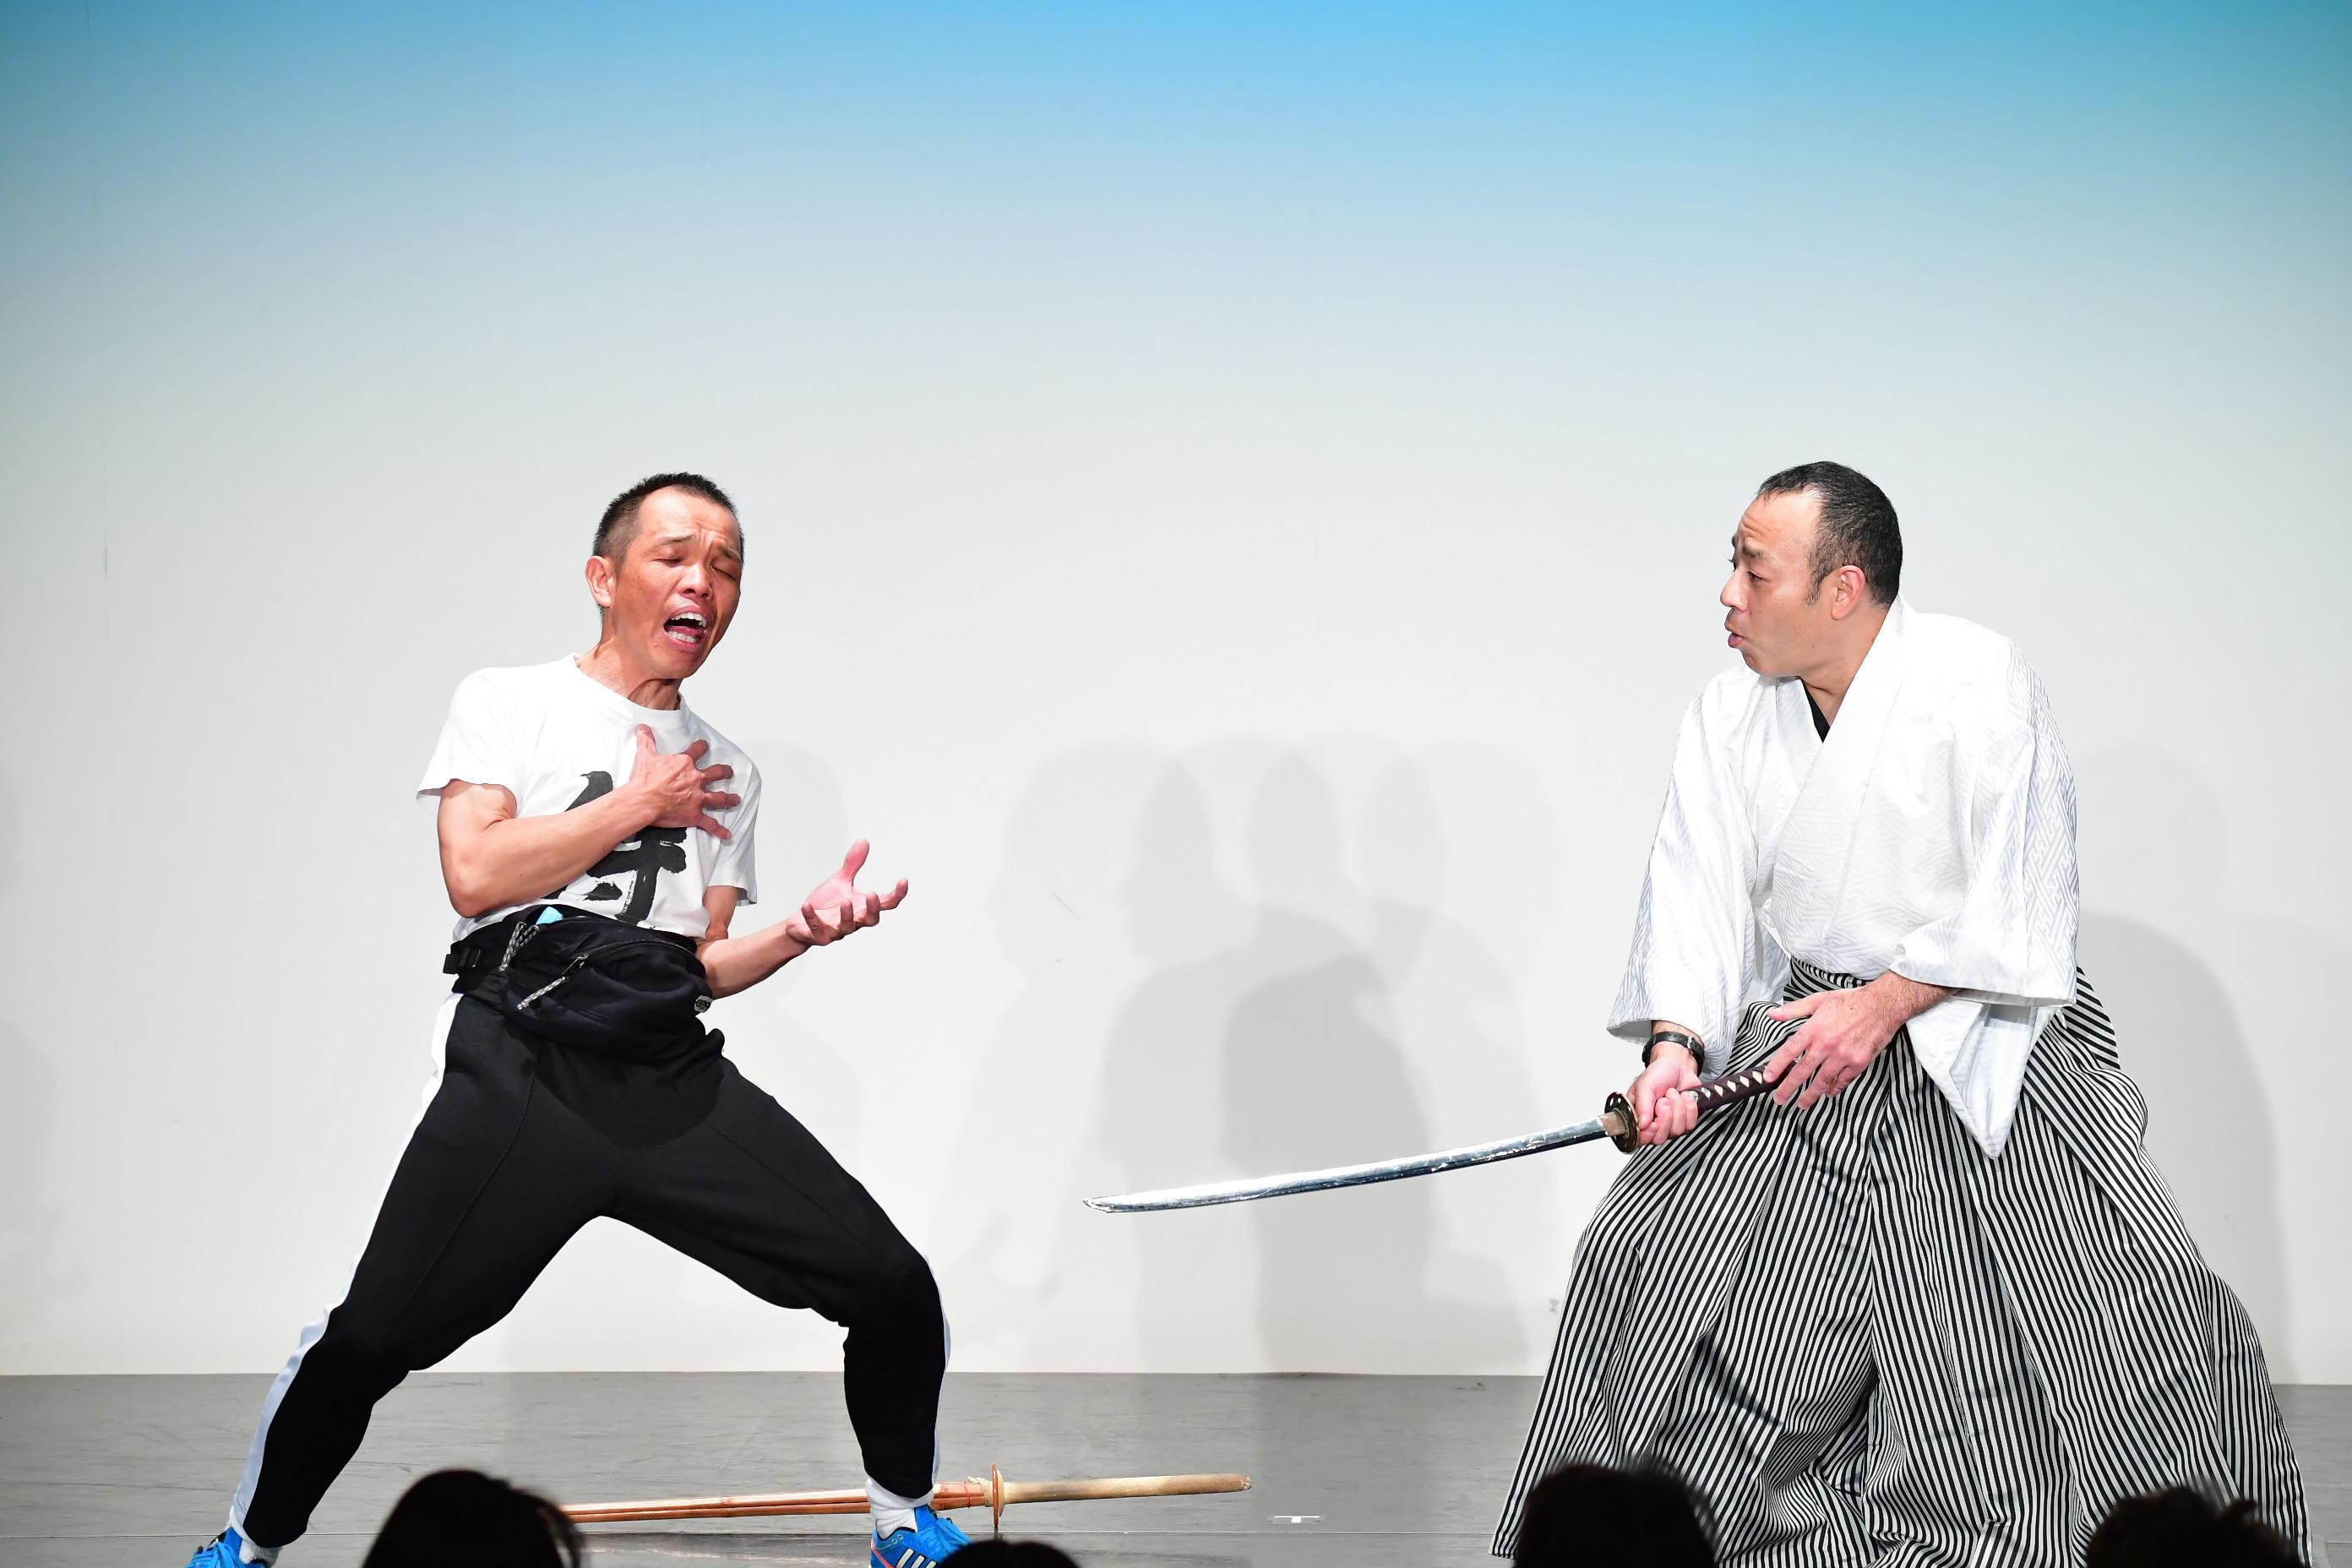 http://news.yoshimoto.co.jp/20181030225338-1b9dbaf561075142432d8a6d18ccc26eeaf0c475.jpg